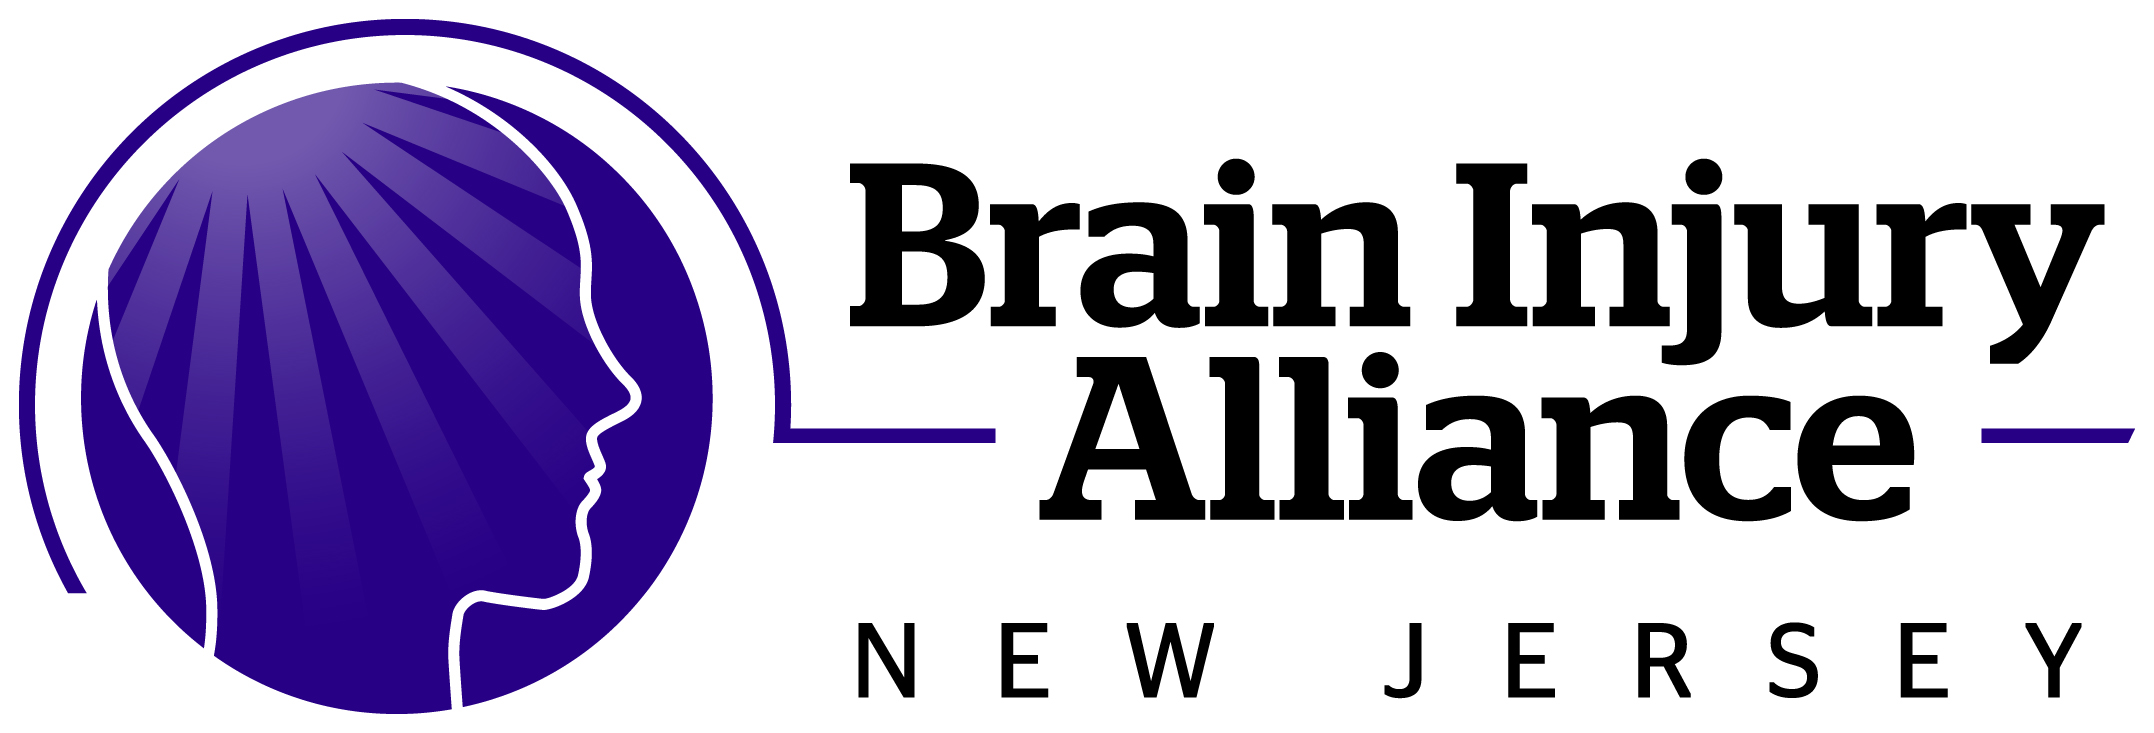 Brian Injury Alliance of New Jersey